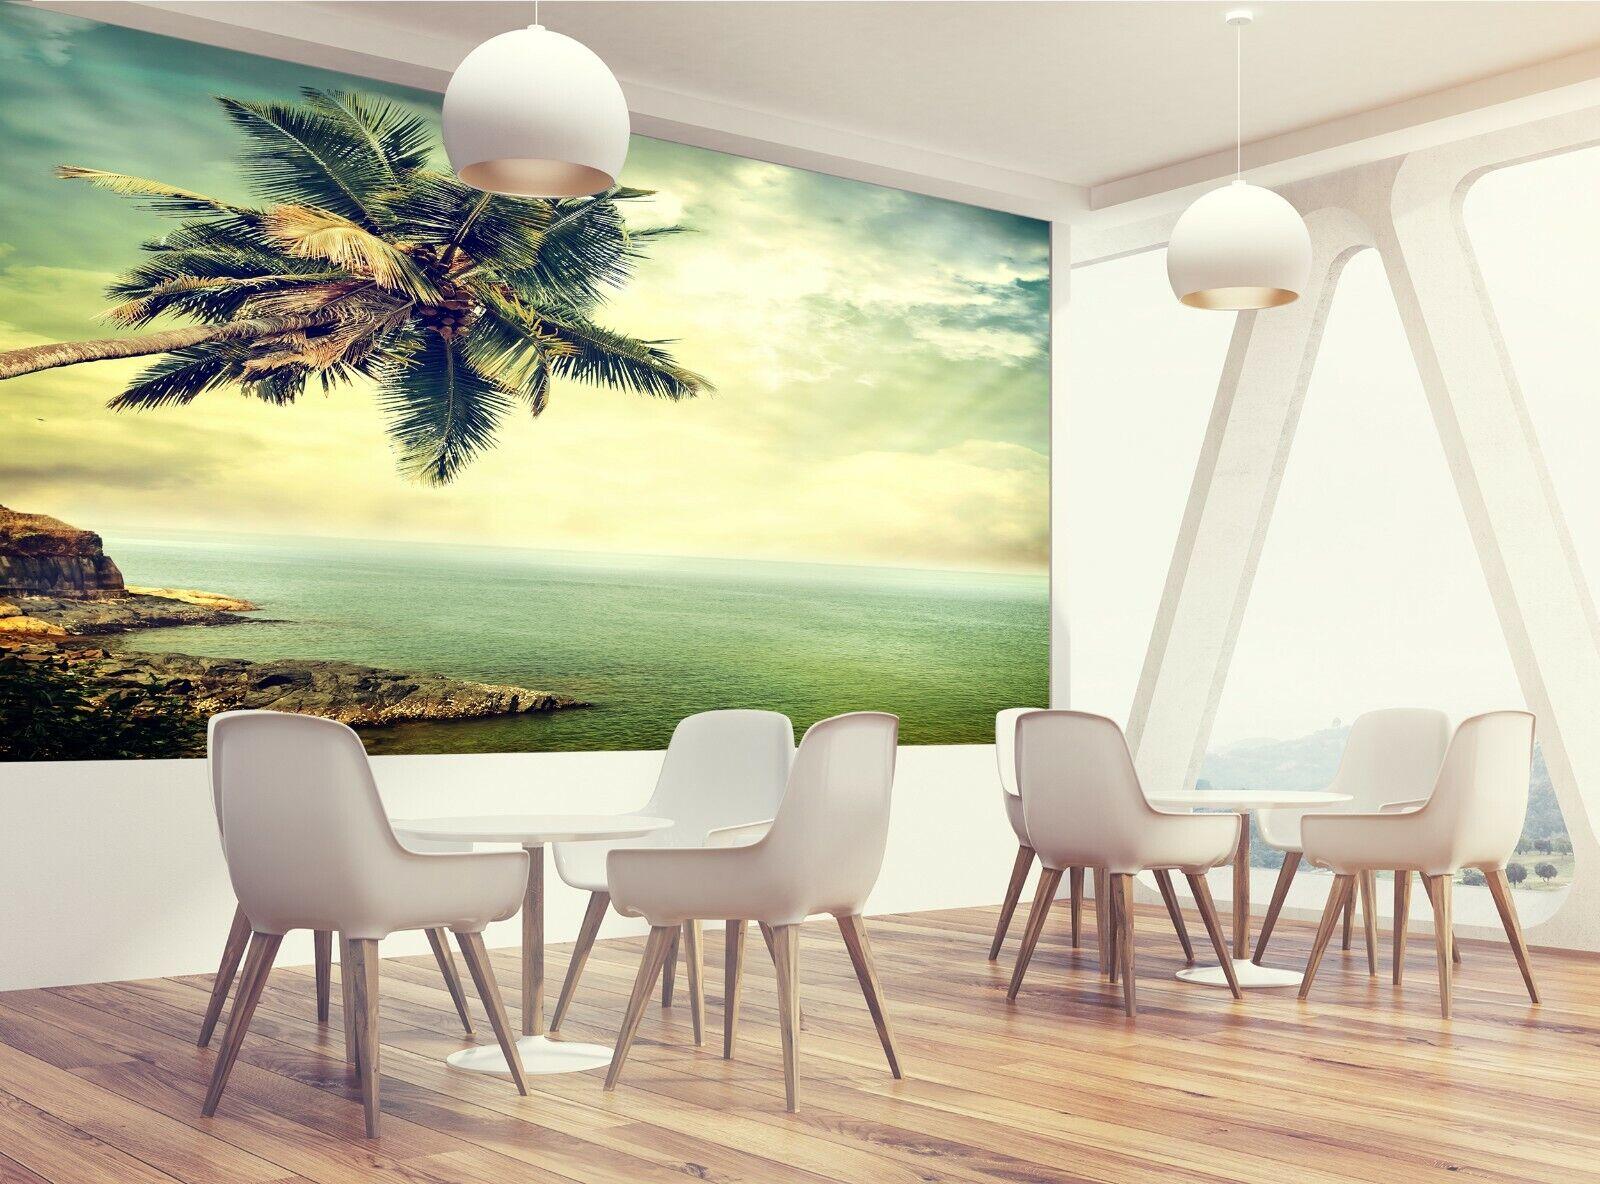 Meer, Himmel, Palmwall Mural Photo Wallpaper GIANT WALL DECOR Free Glue